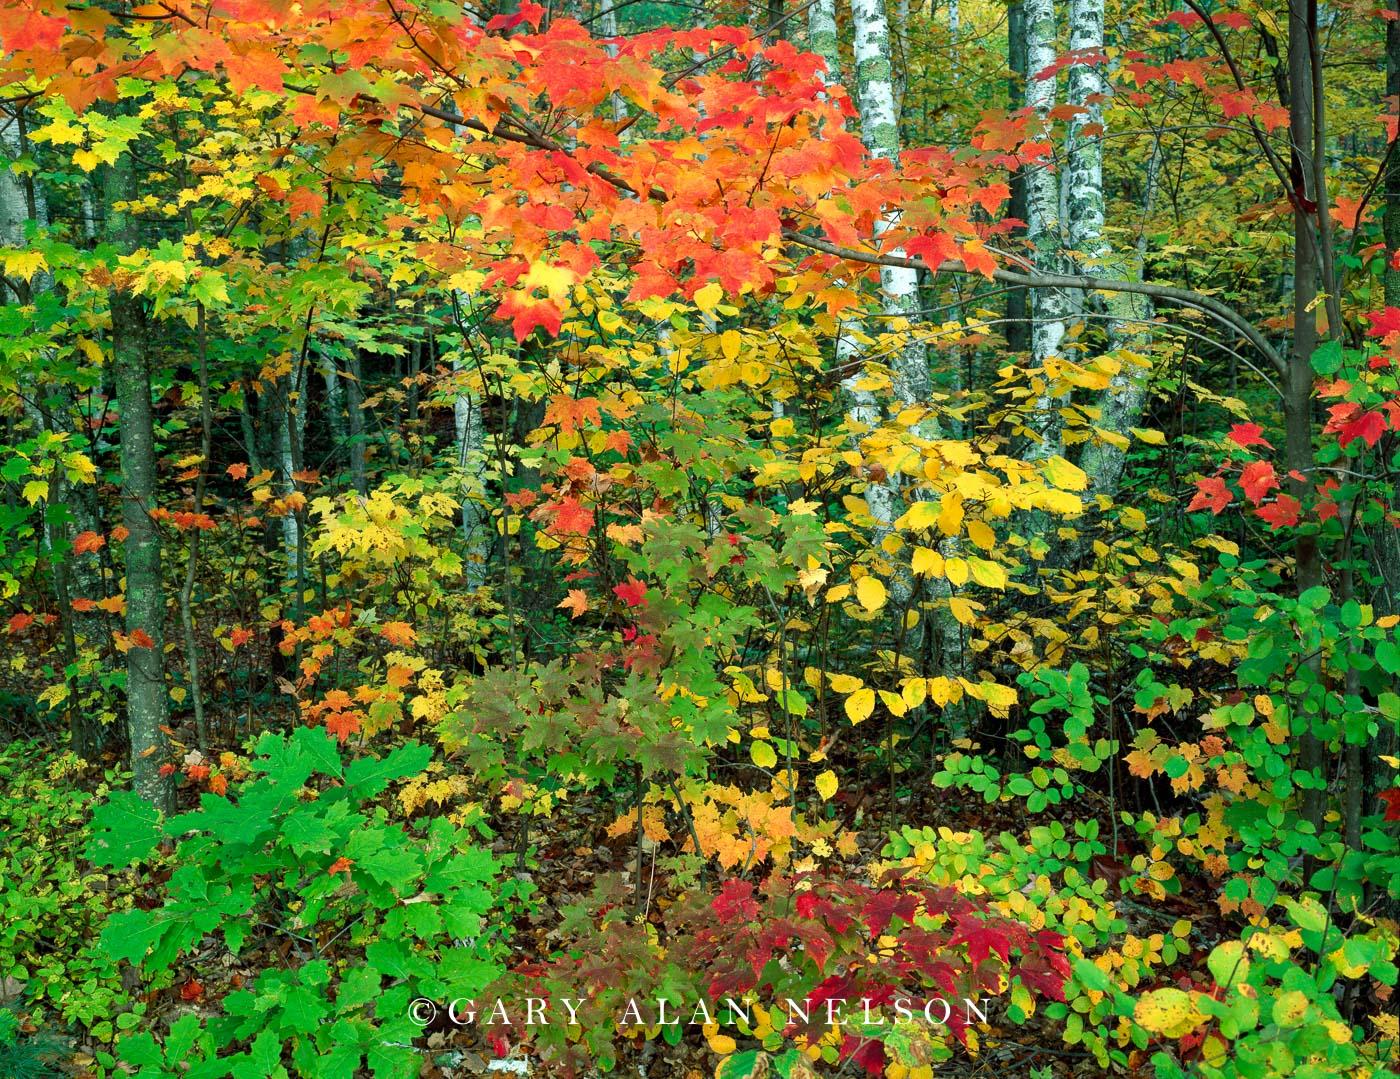 state park, minnesota, autumn colors, photo